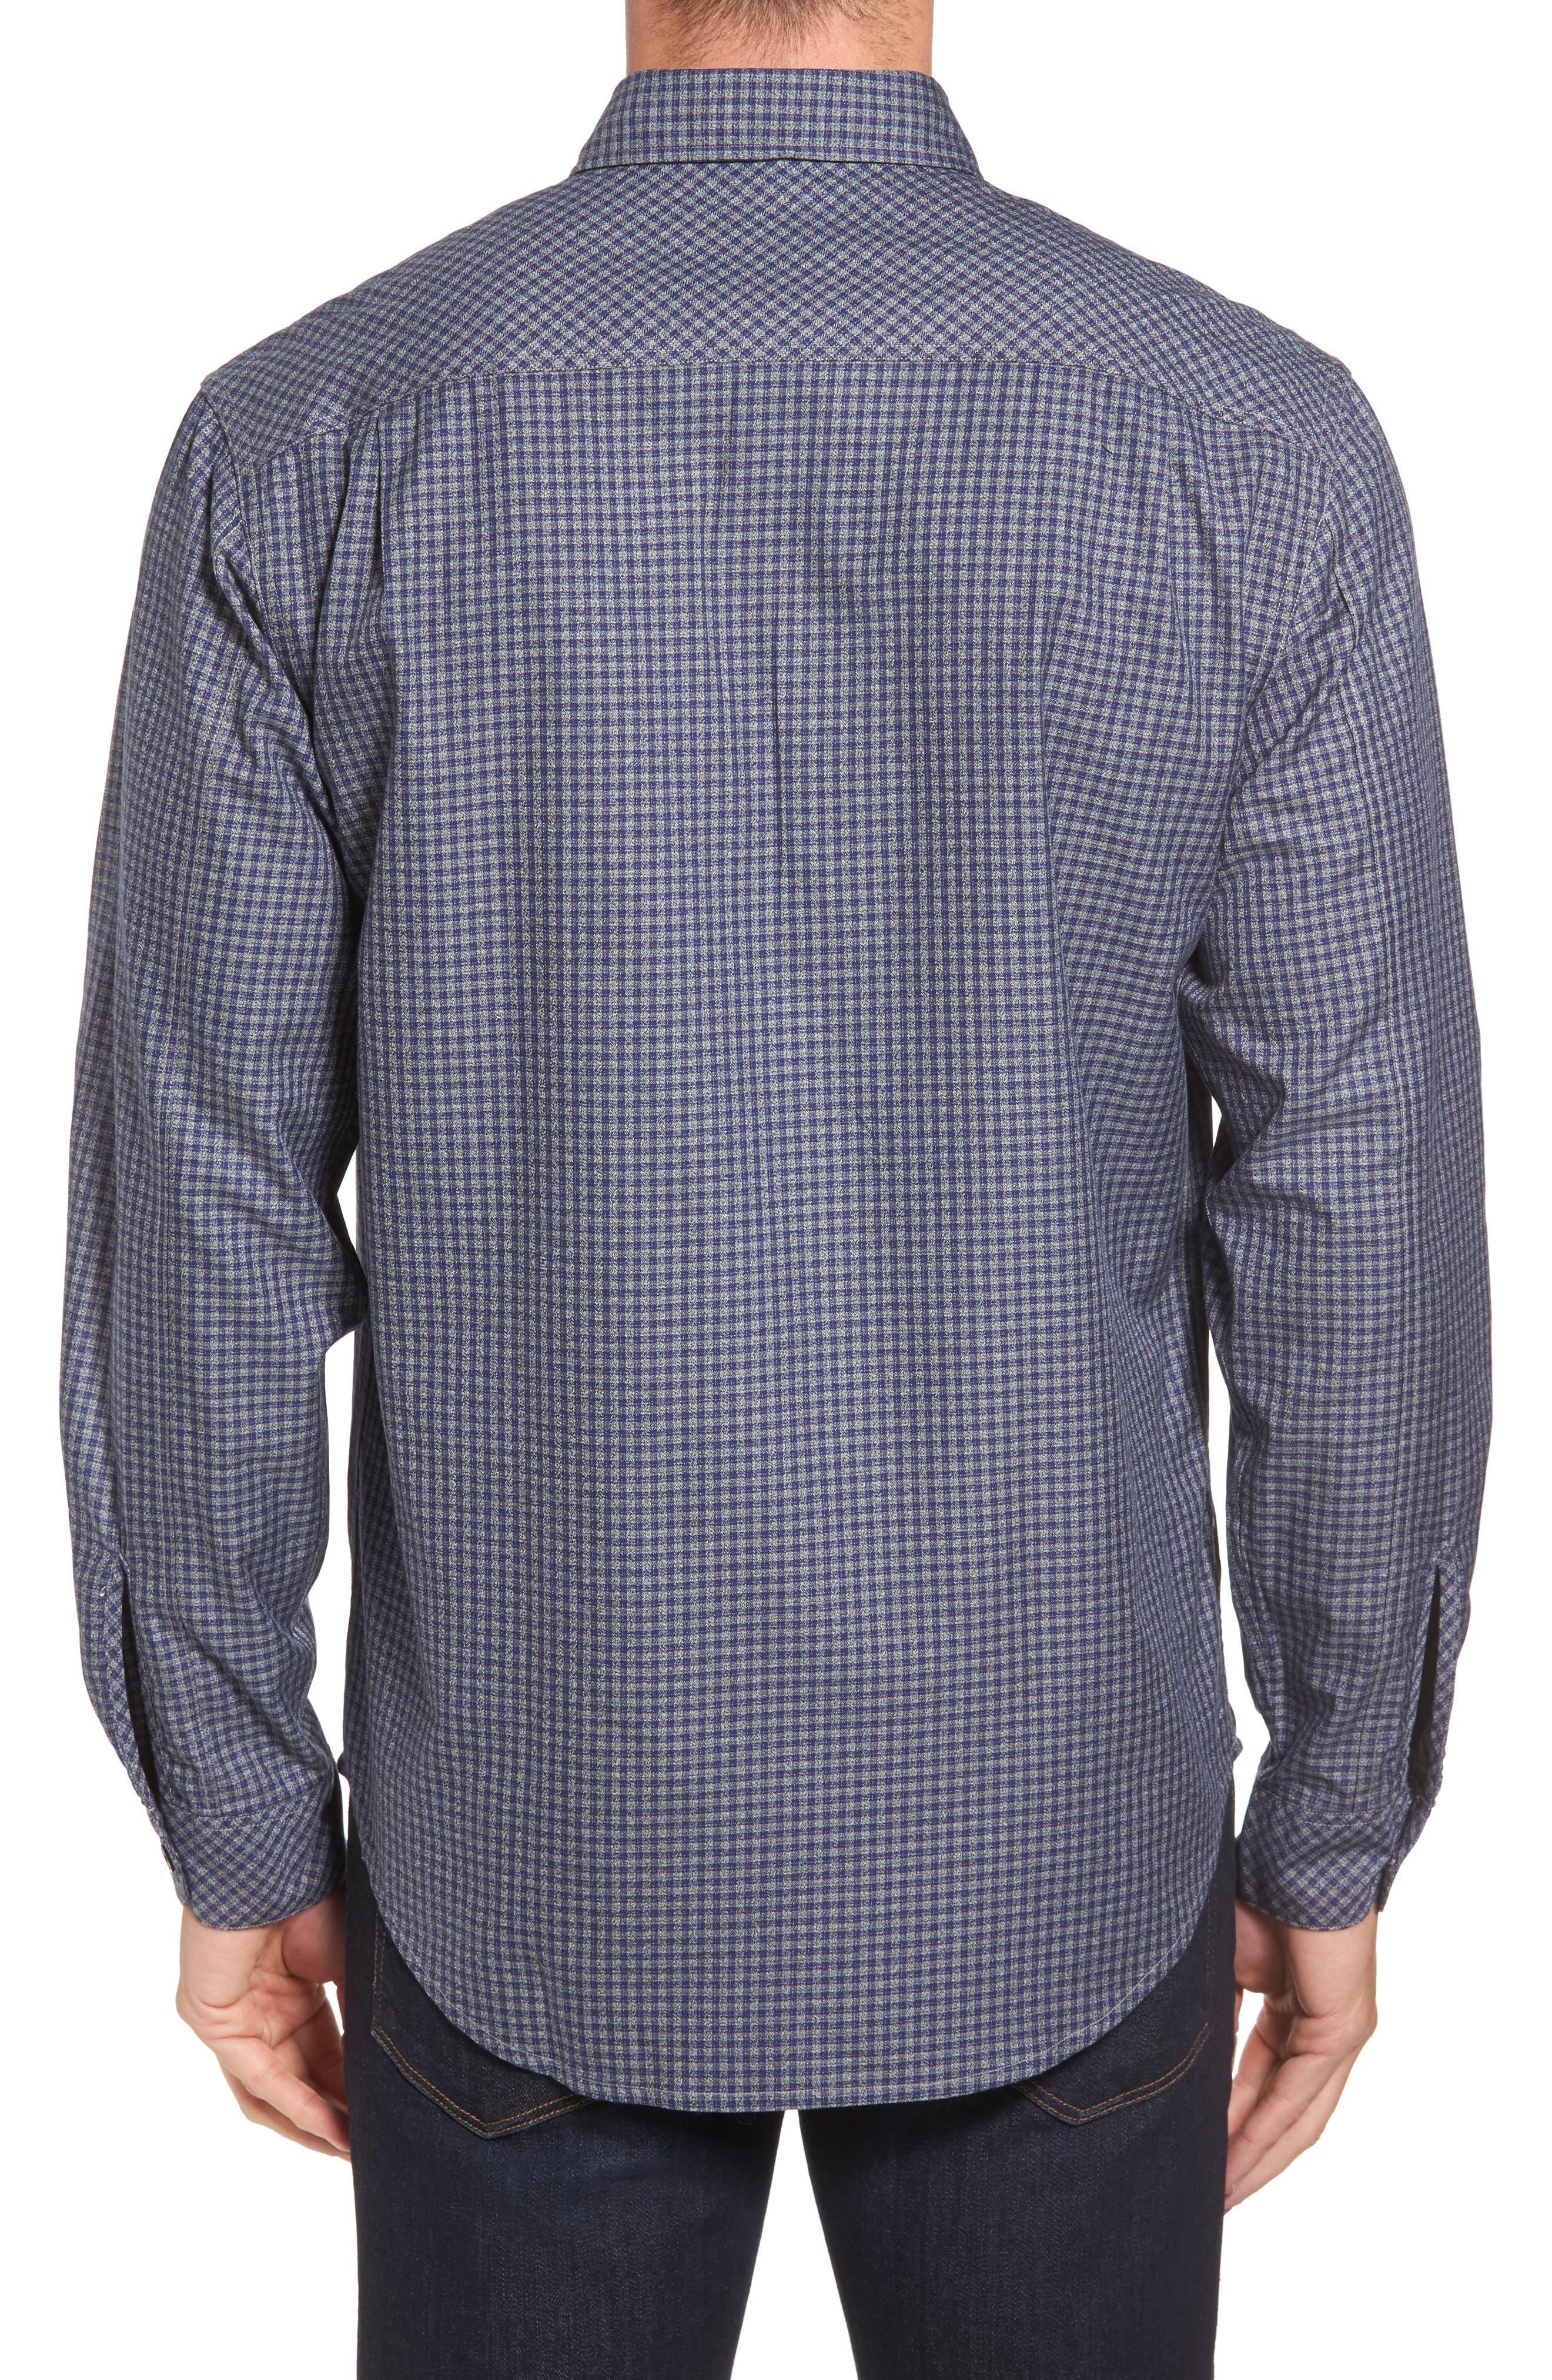 Main Street Check Flannel Shirt,                             Alternate thumbnail 2, color,                             405